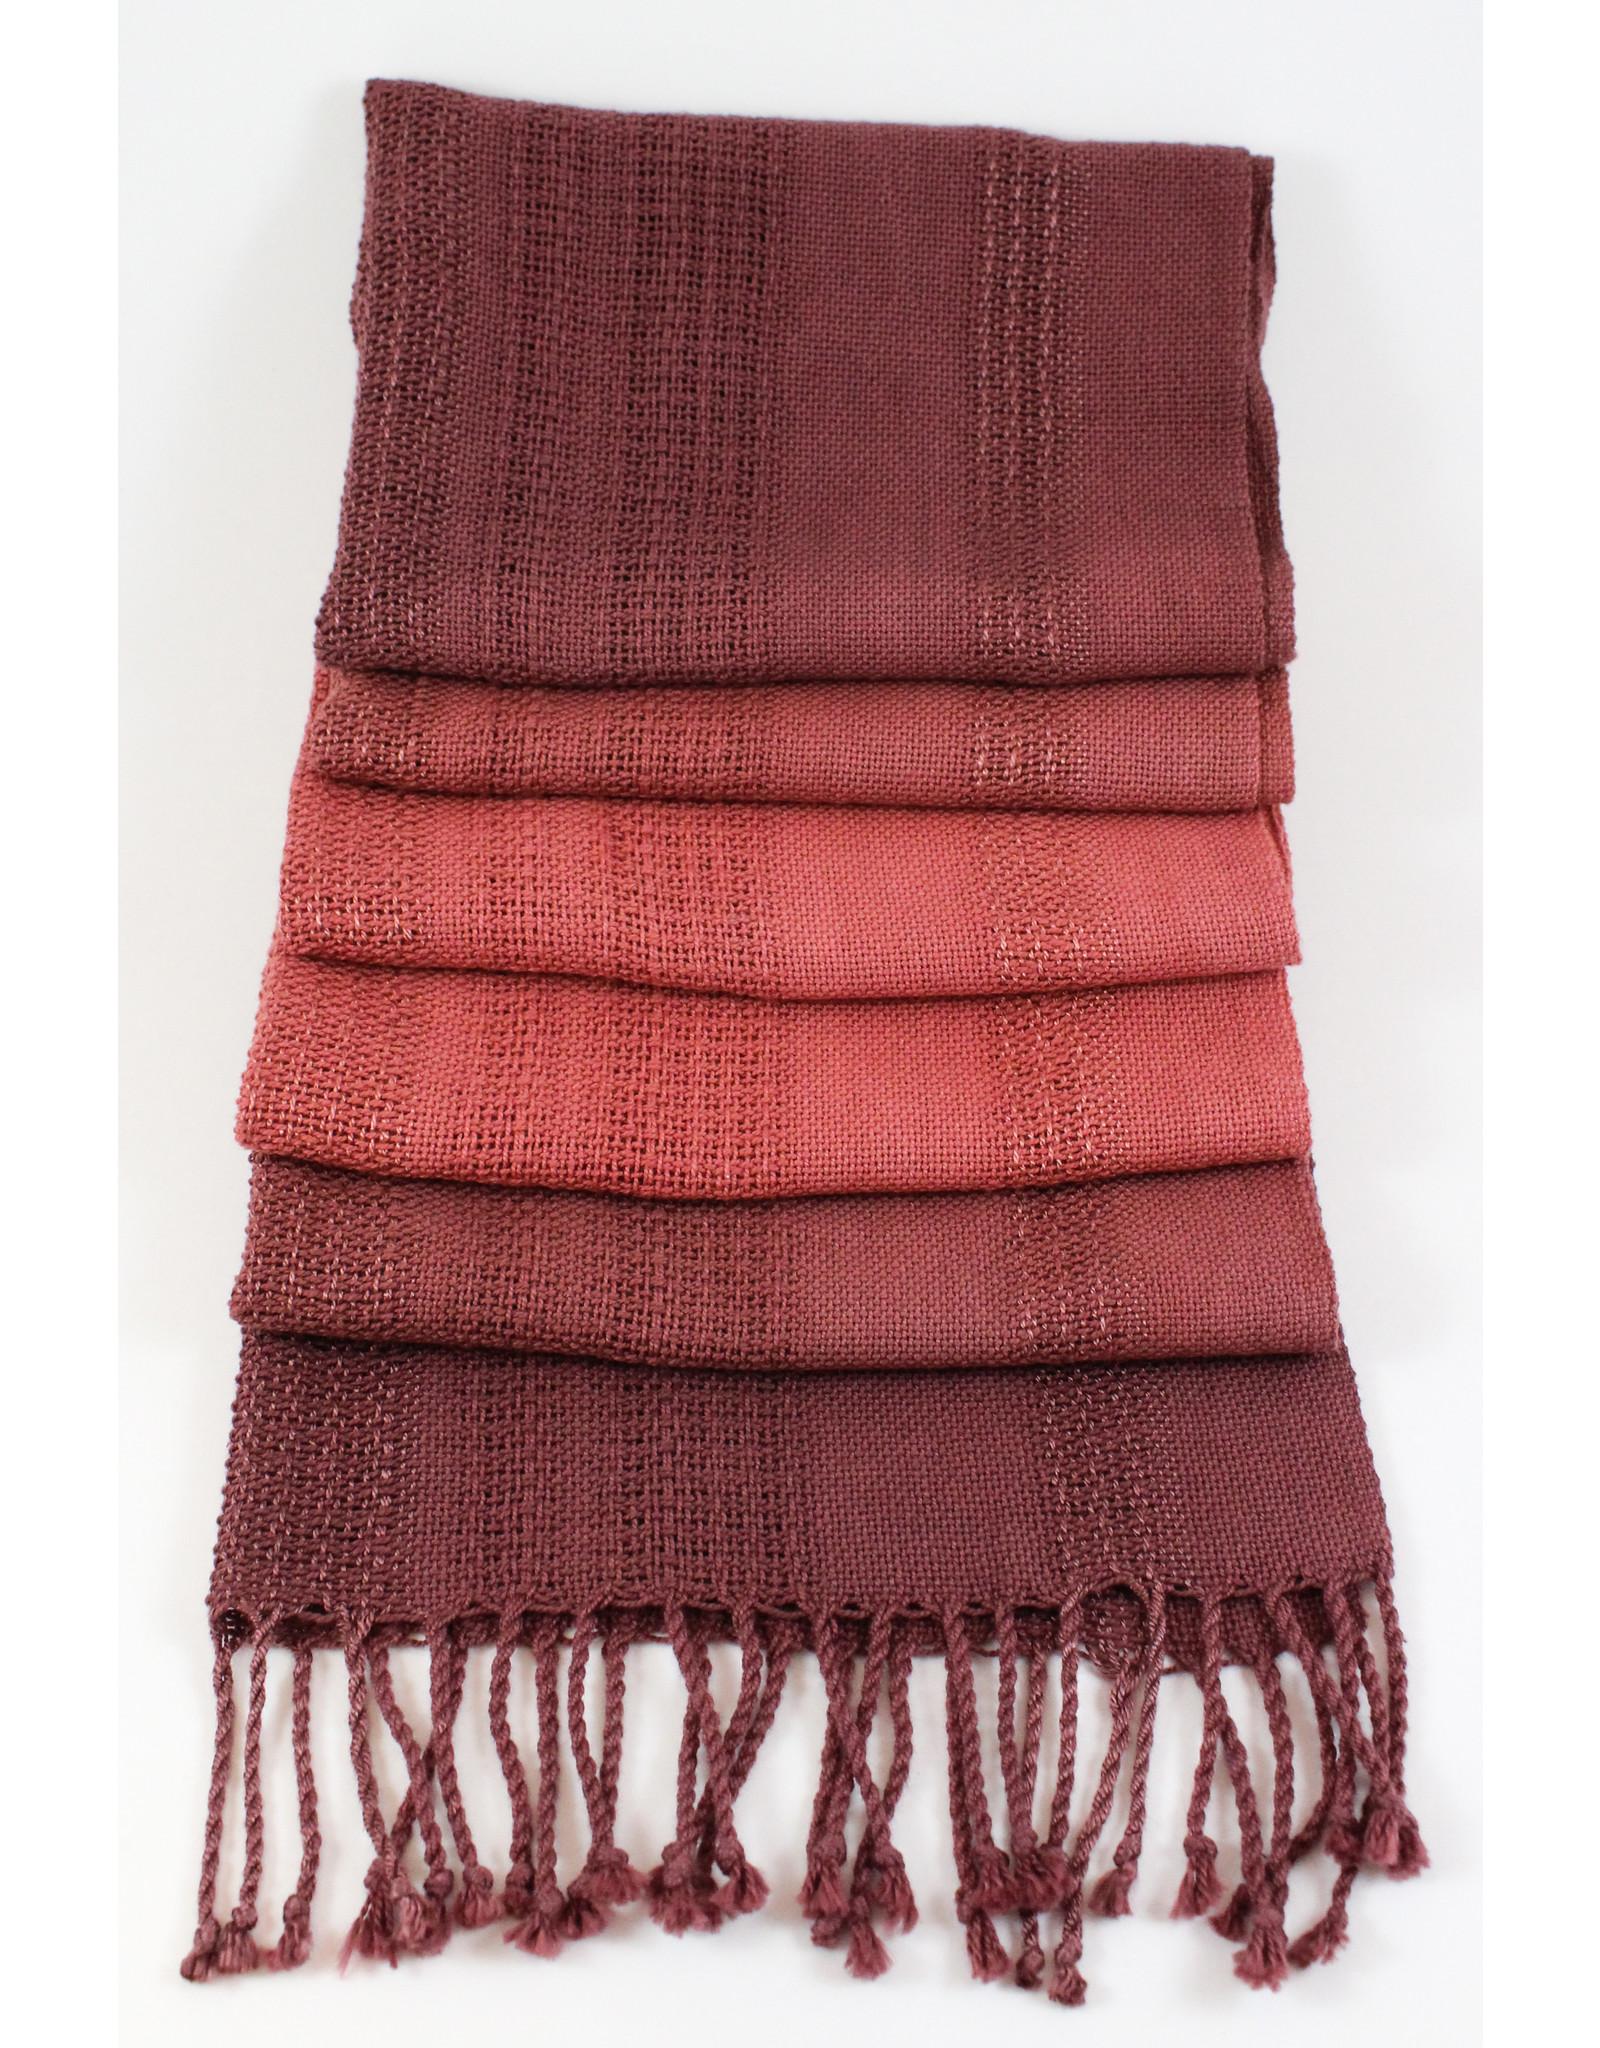 Jane Alderdice Cotton and Bamboo Dip-Dyed Scarf, handwoven by Jane Alderdice